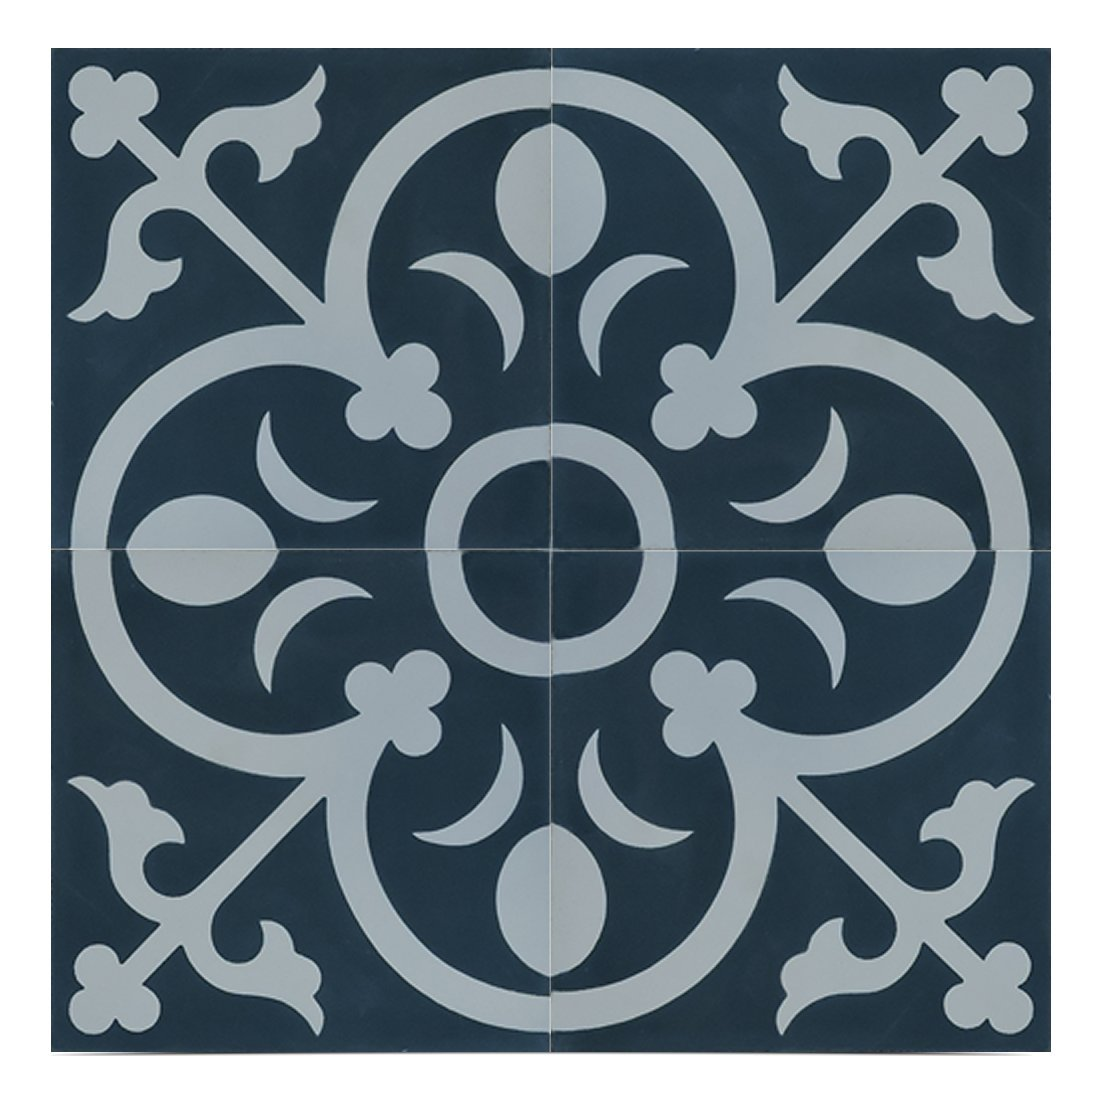 Moroccan Mosaic & Tile House CTP31-07 NadorCTP31-07 Nador 8''x8'' Handmade Cement Tile in Navy Blue/White